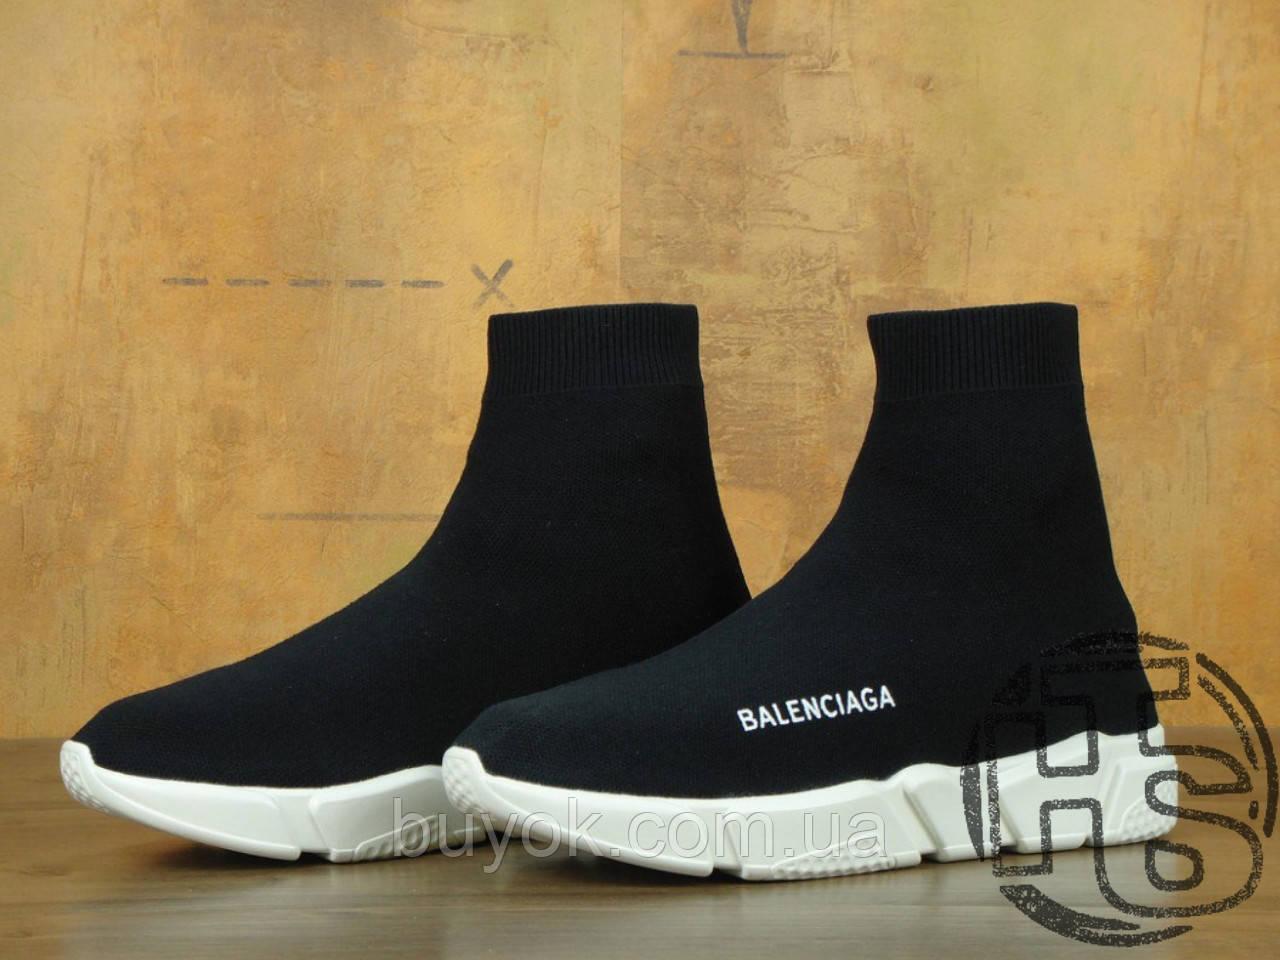 Мужские кроссовки Balenciaga Knit High-Top Sneakers Black/White 504880899